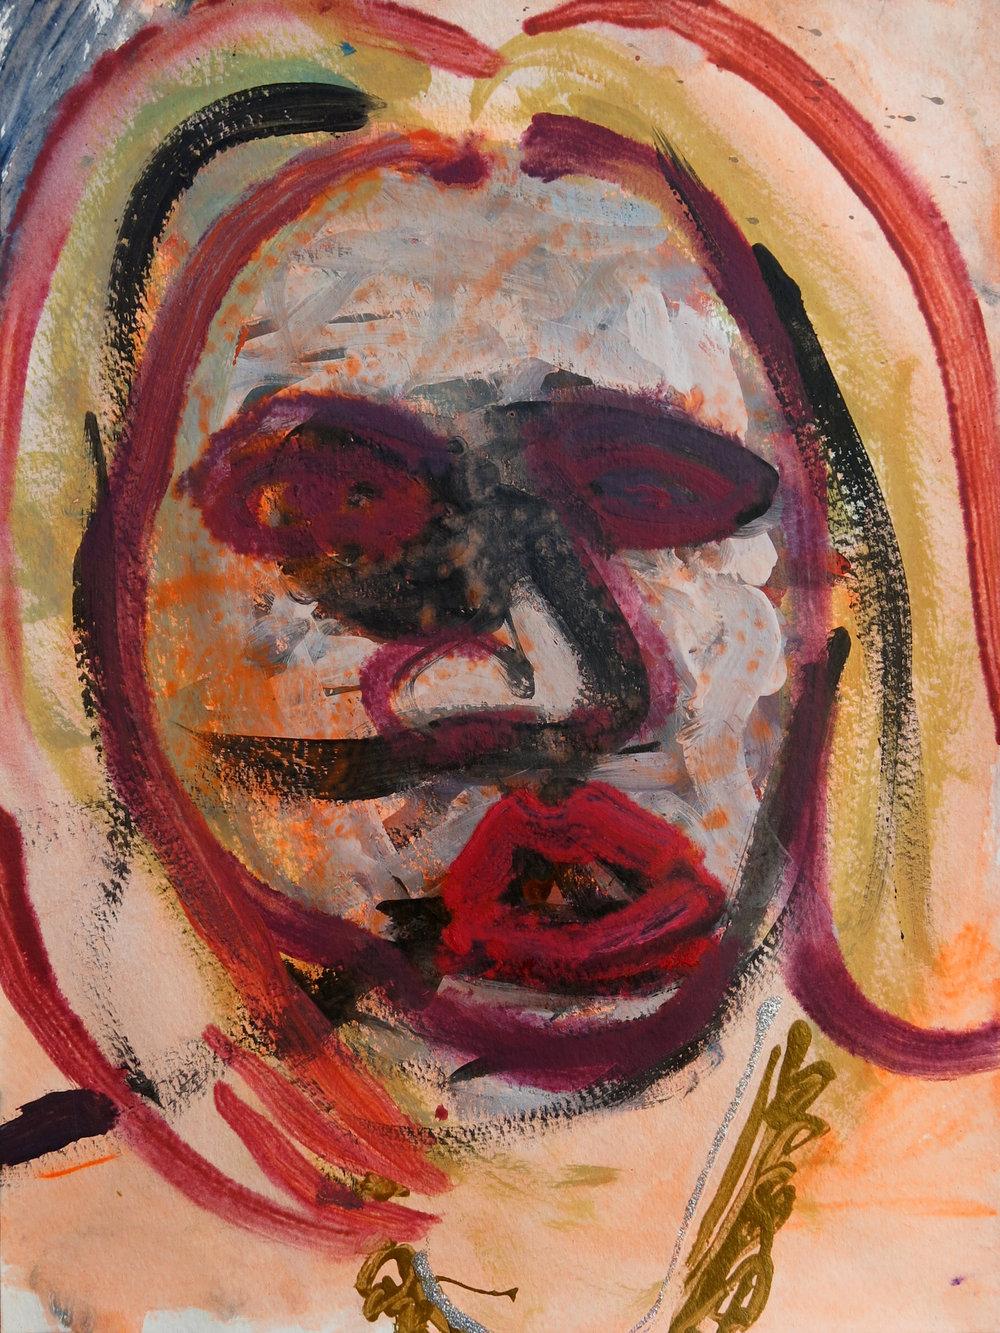 Barbra Streisand Portrait #224